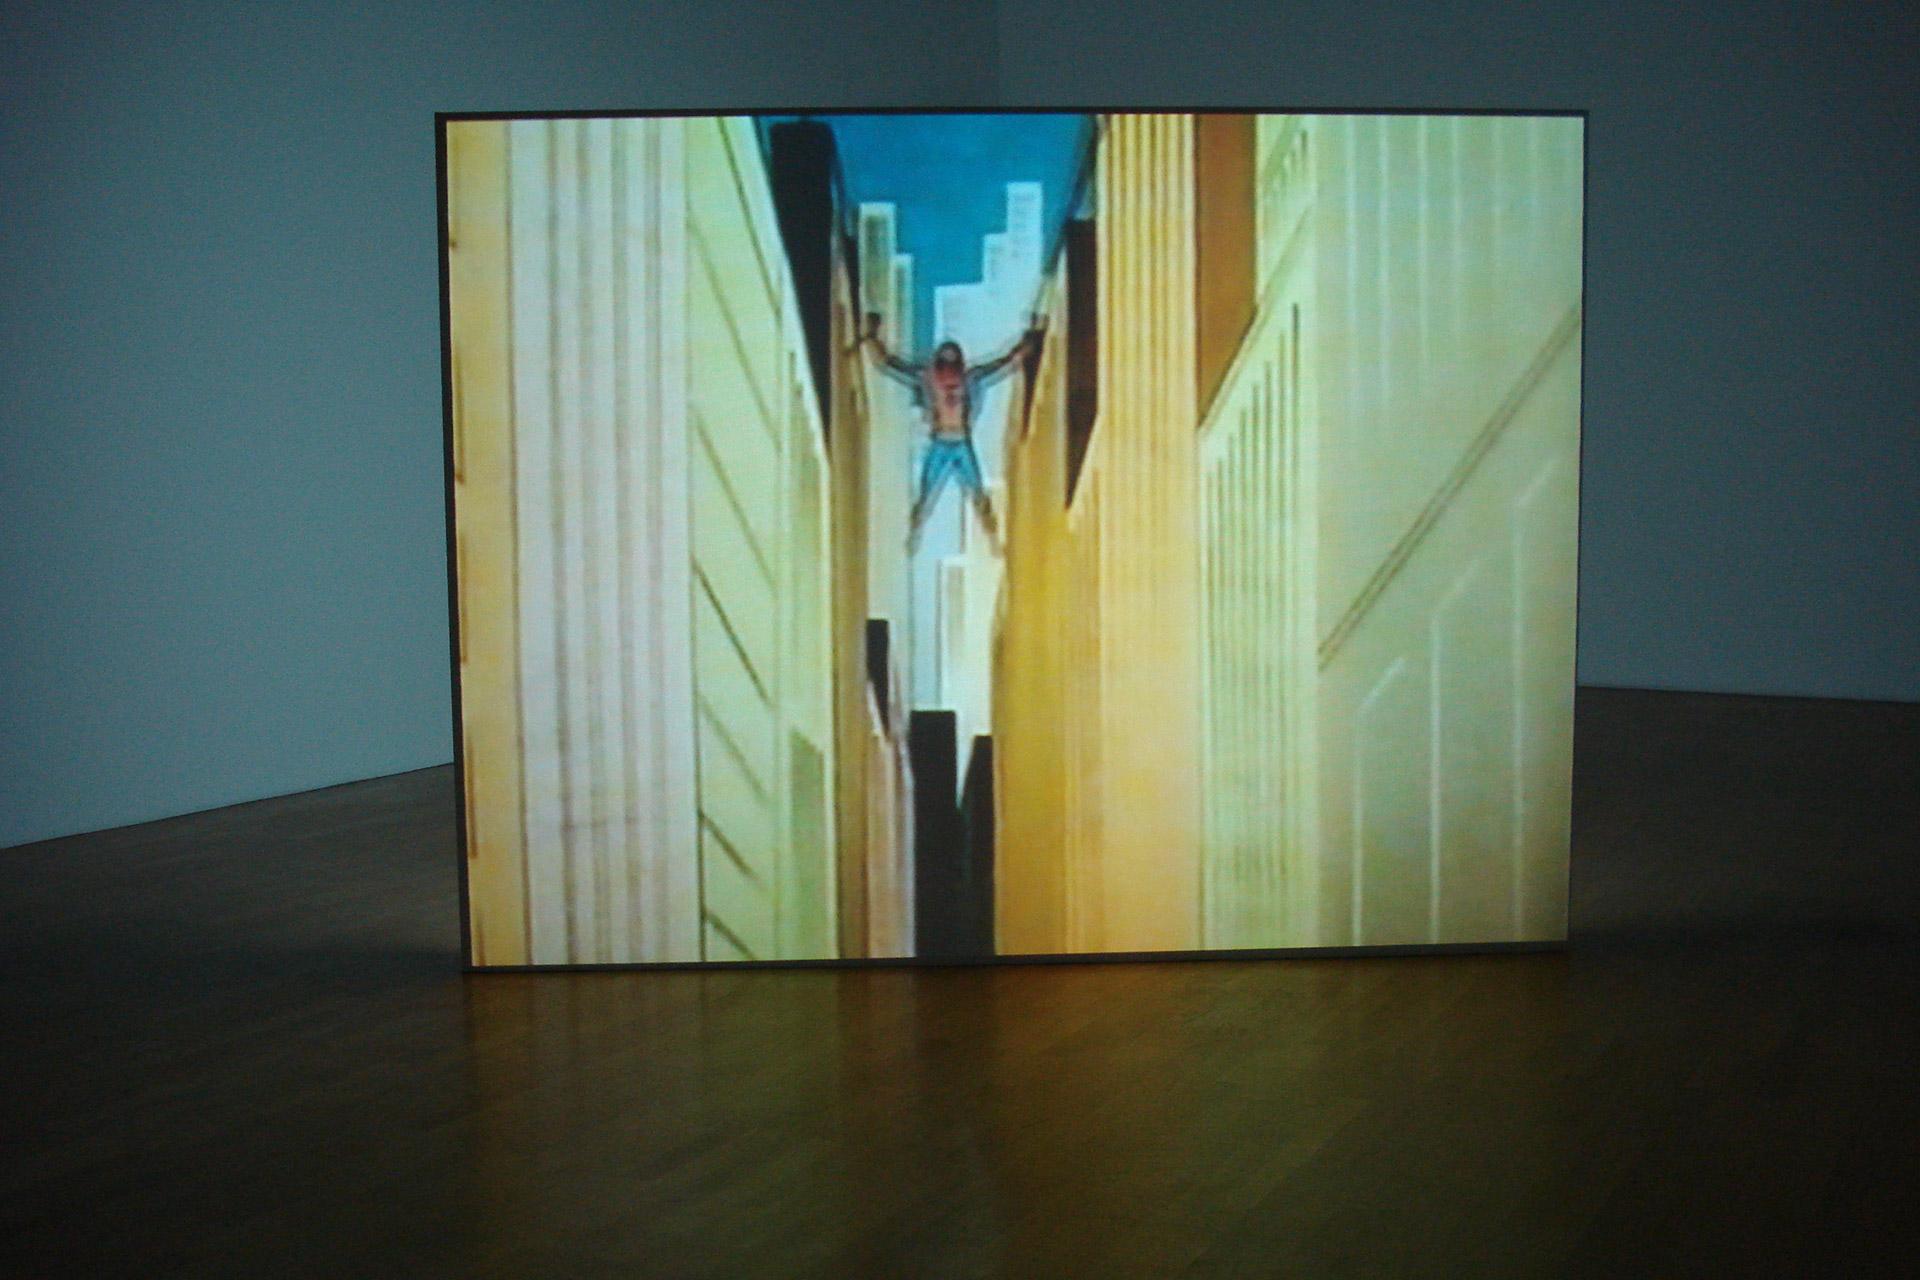 Hito-Steyerl-Kunsthalle-Winterthur-2008-1.jpg